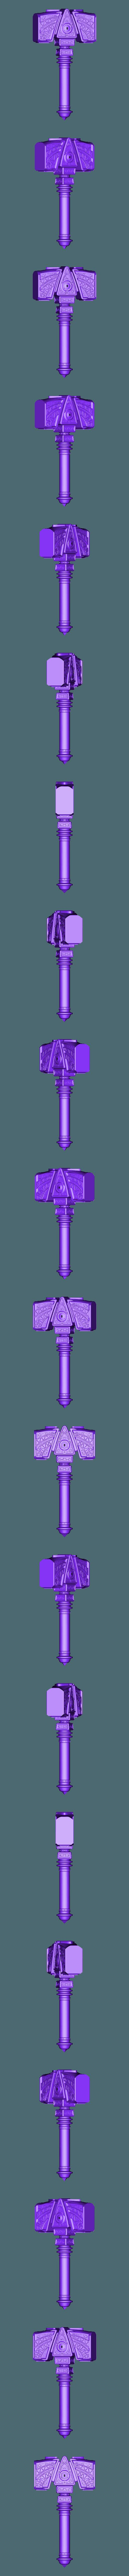 mt_2301.stl Download free STL file Mjölnir • 3D printing object, Boris3dStudio